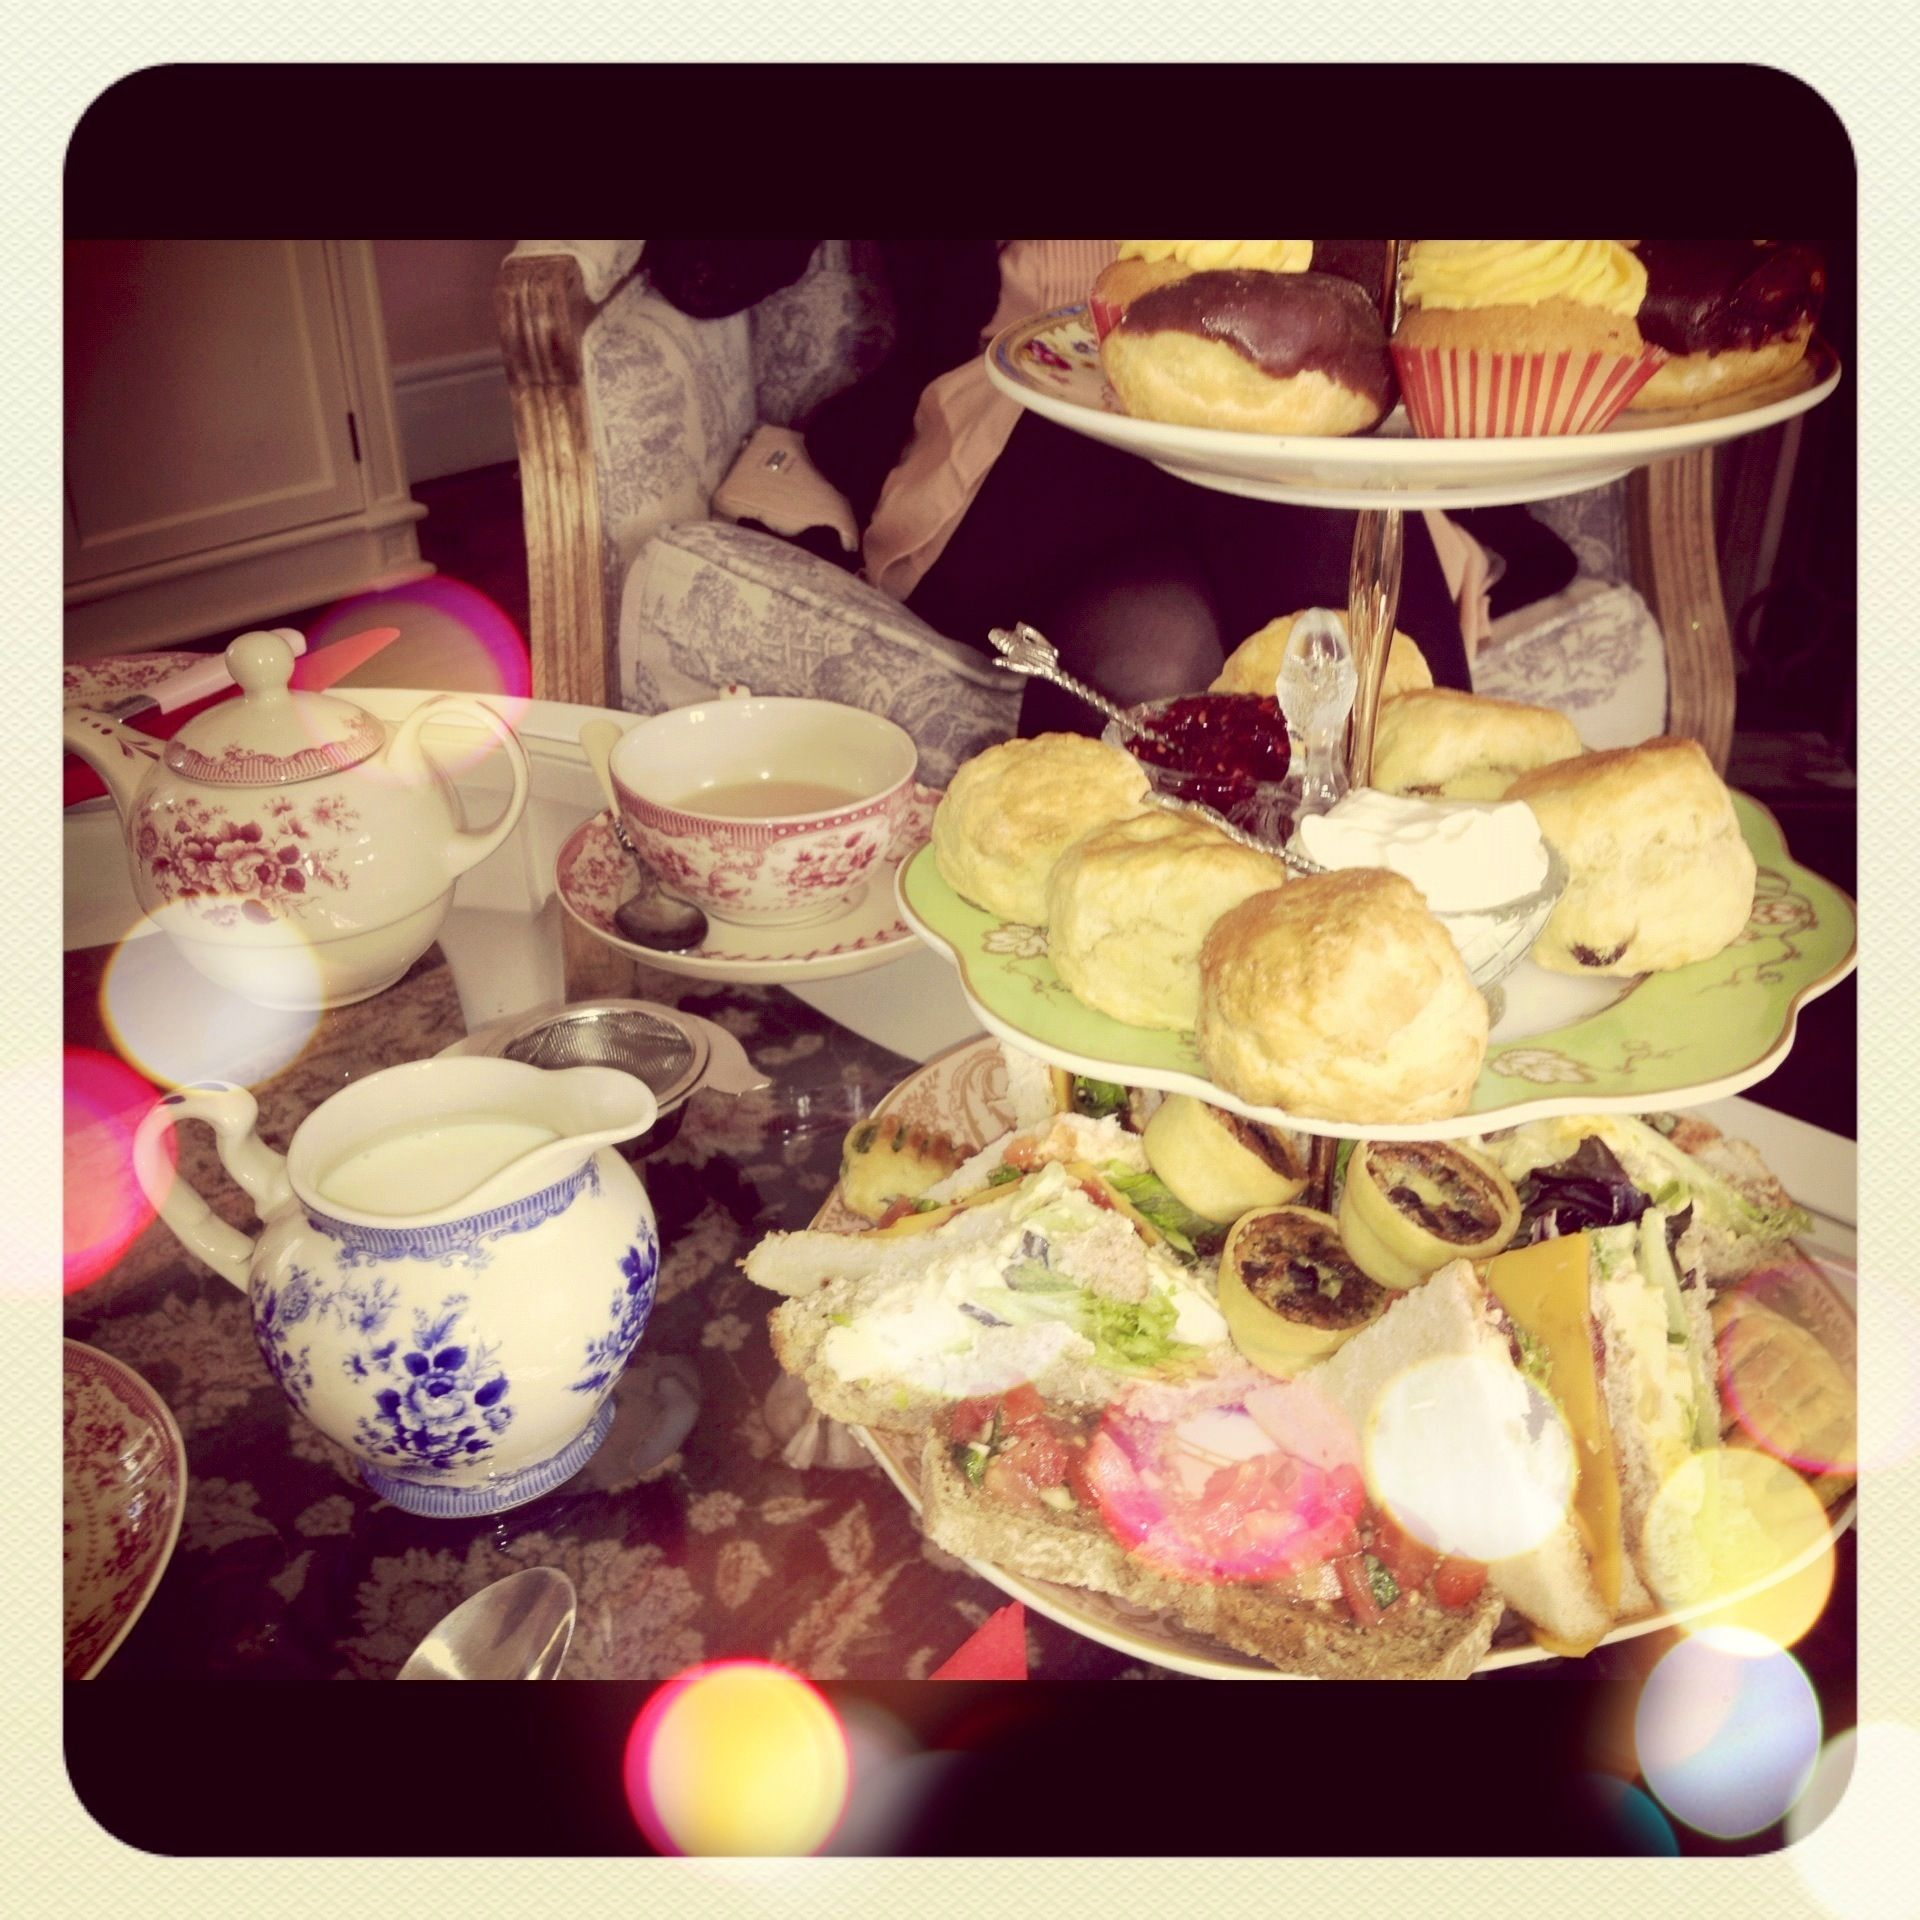 Afternoon tea in Adare, Co. Limerick, Ireland. ☕